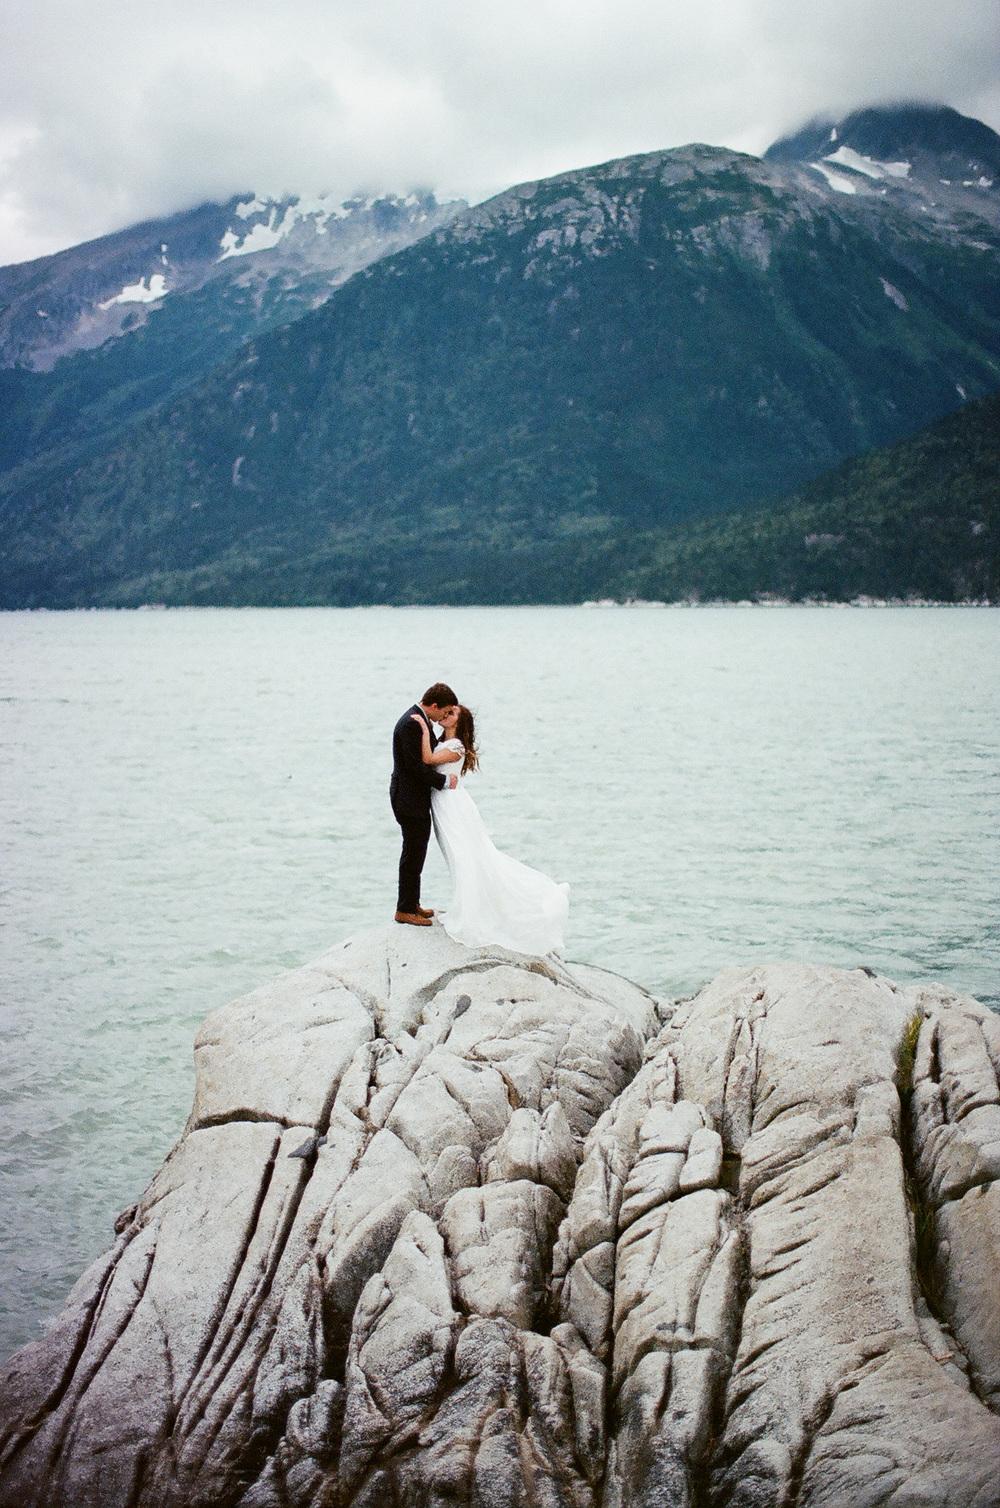 AlaskaFilm2014 (11 of 36).jpg